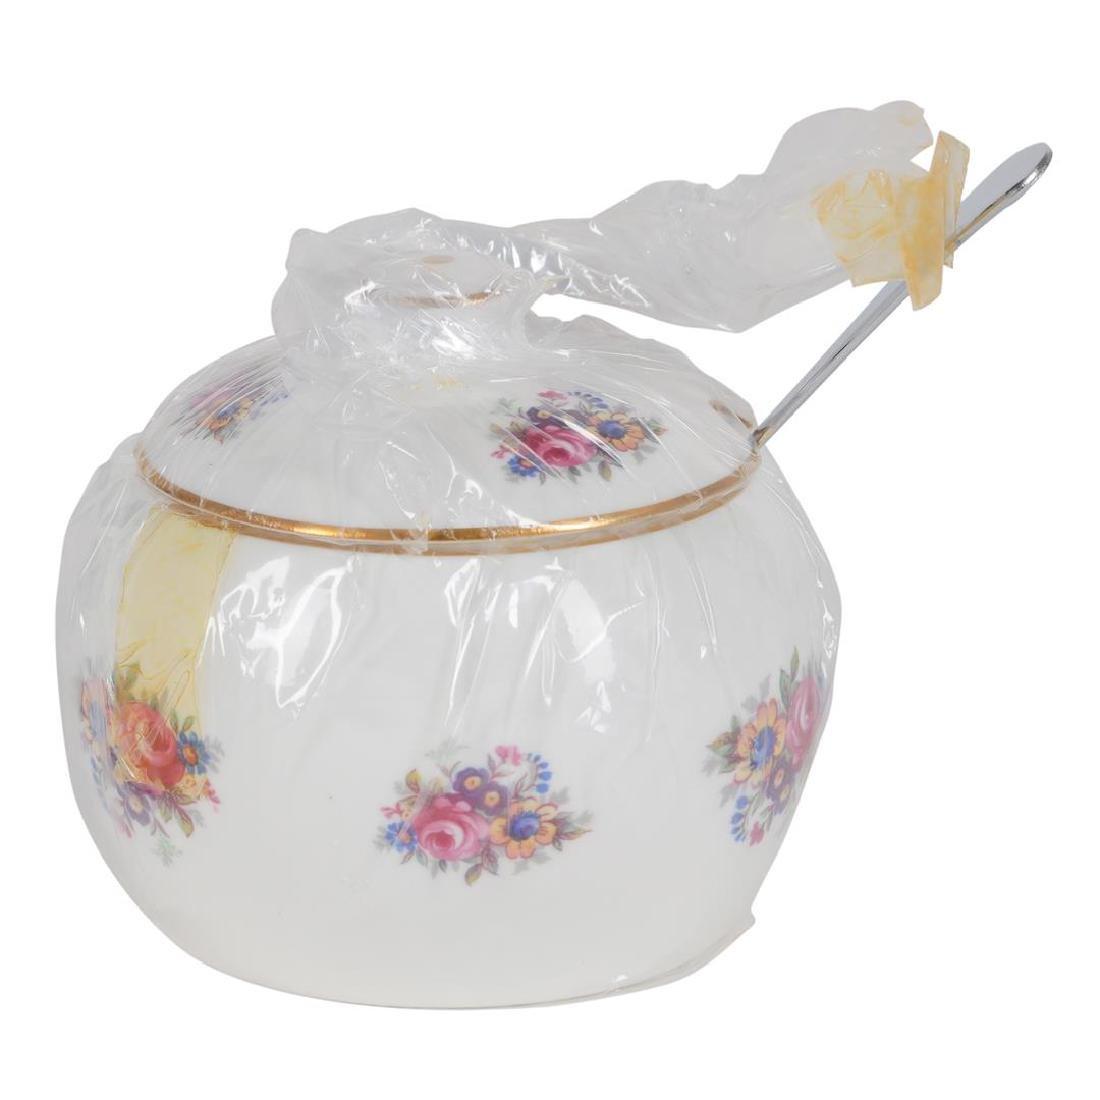 Abbeydale Chelsea Rose China Sugar Bowl - 3